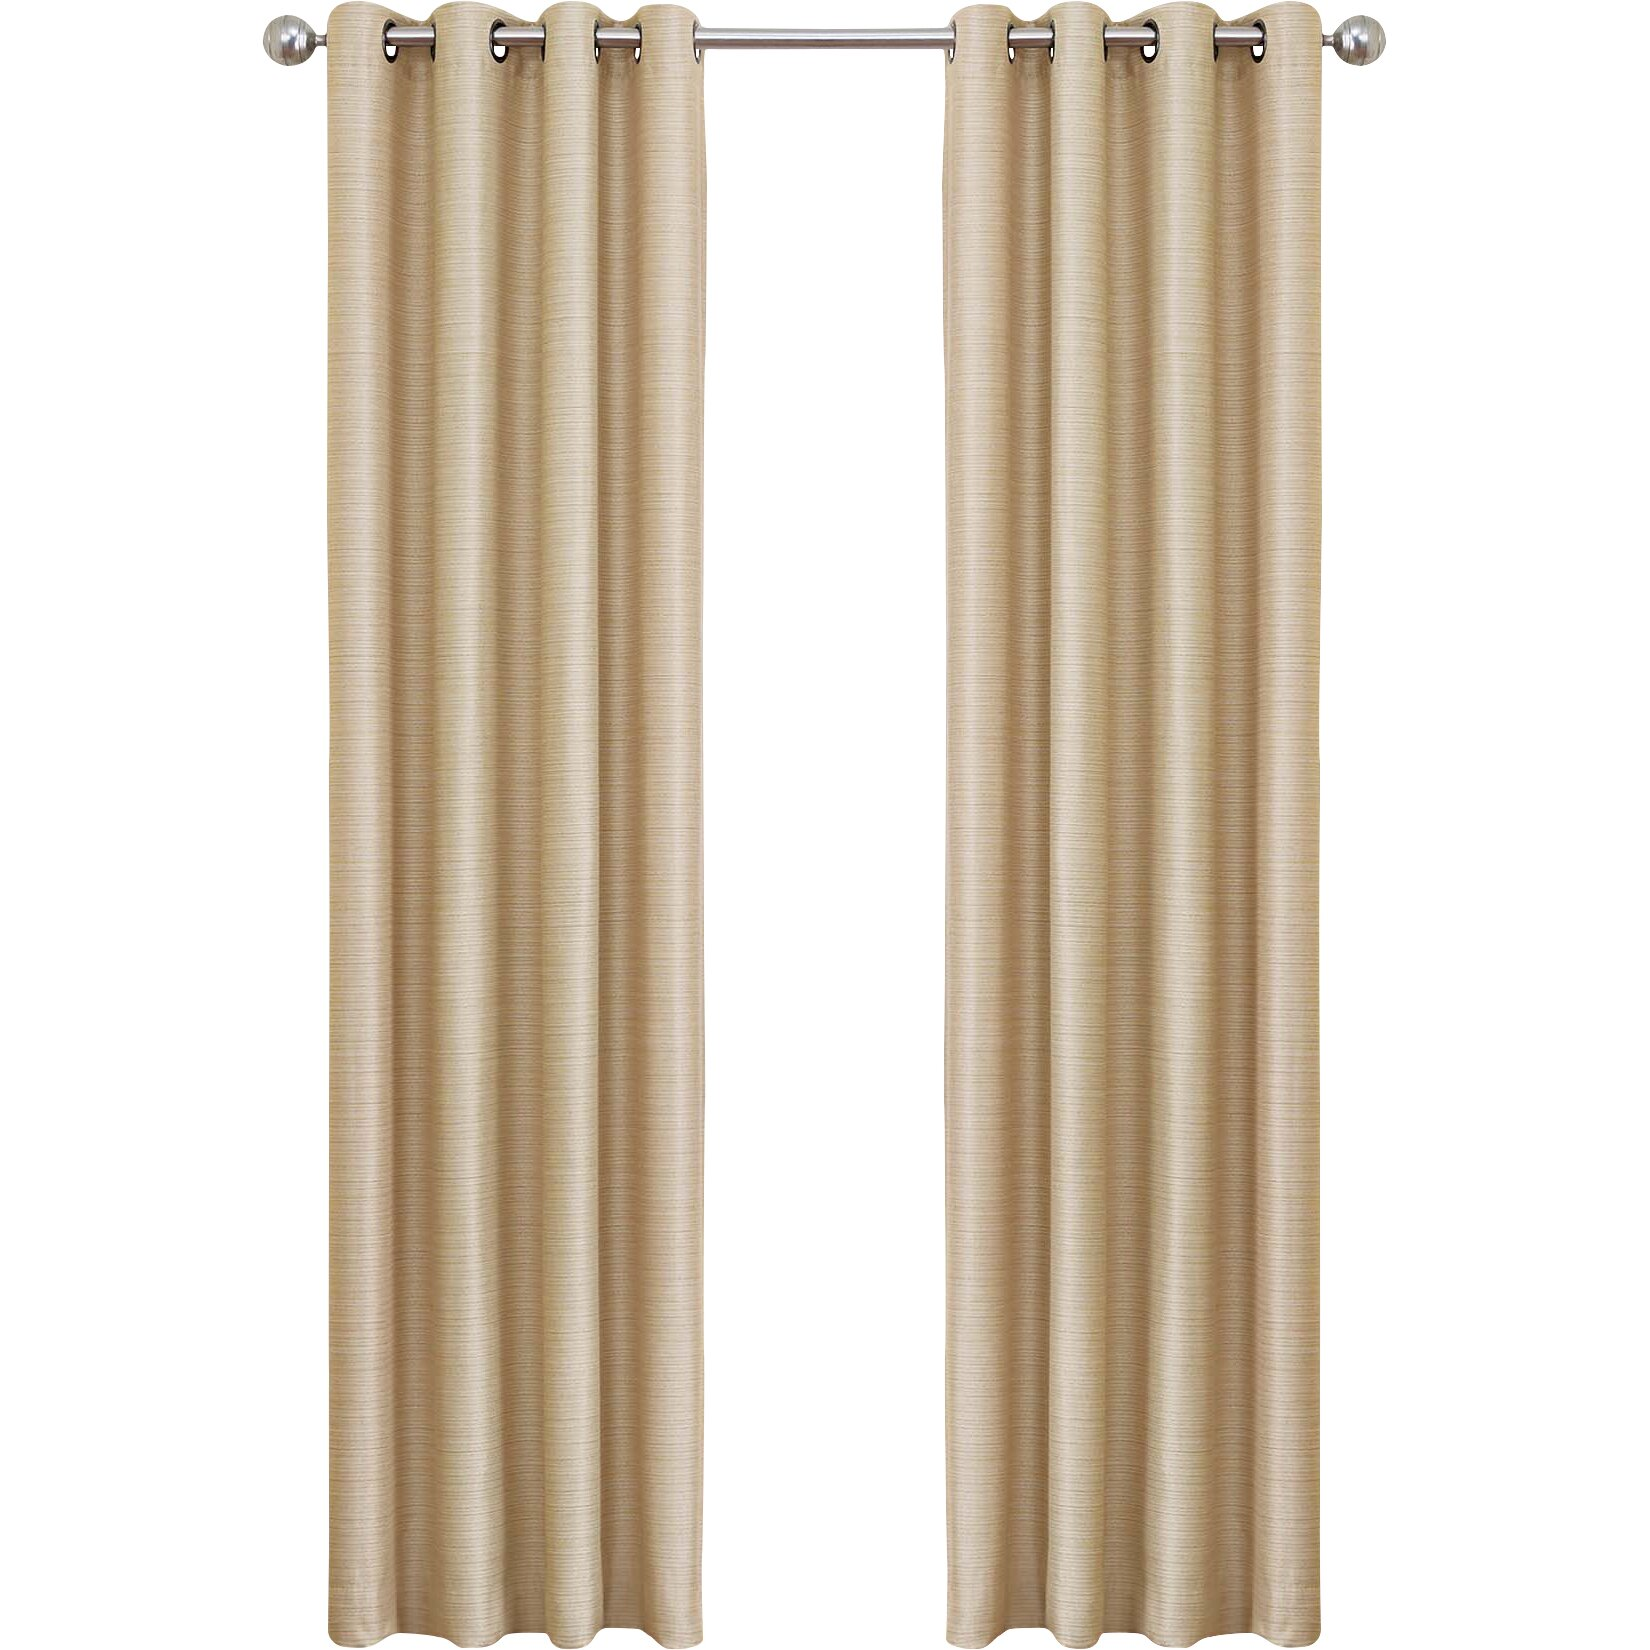 Marvelous ... Grommet Curtains 108 Length By Varick Gallery Mcgriff Solid Blackout  Grommet Single ...